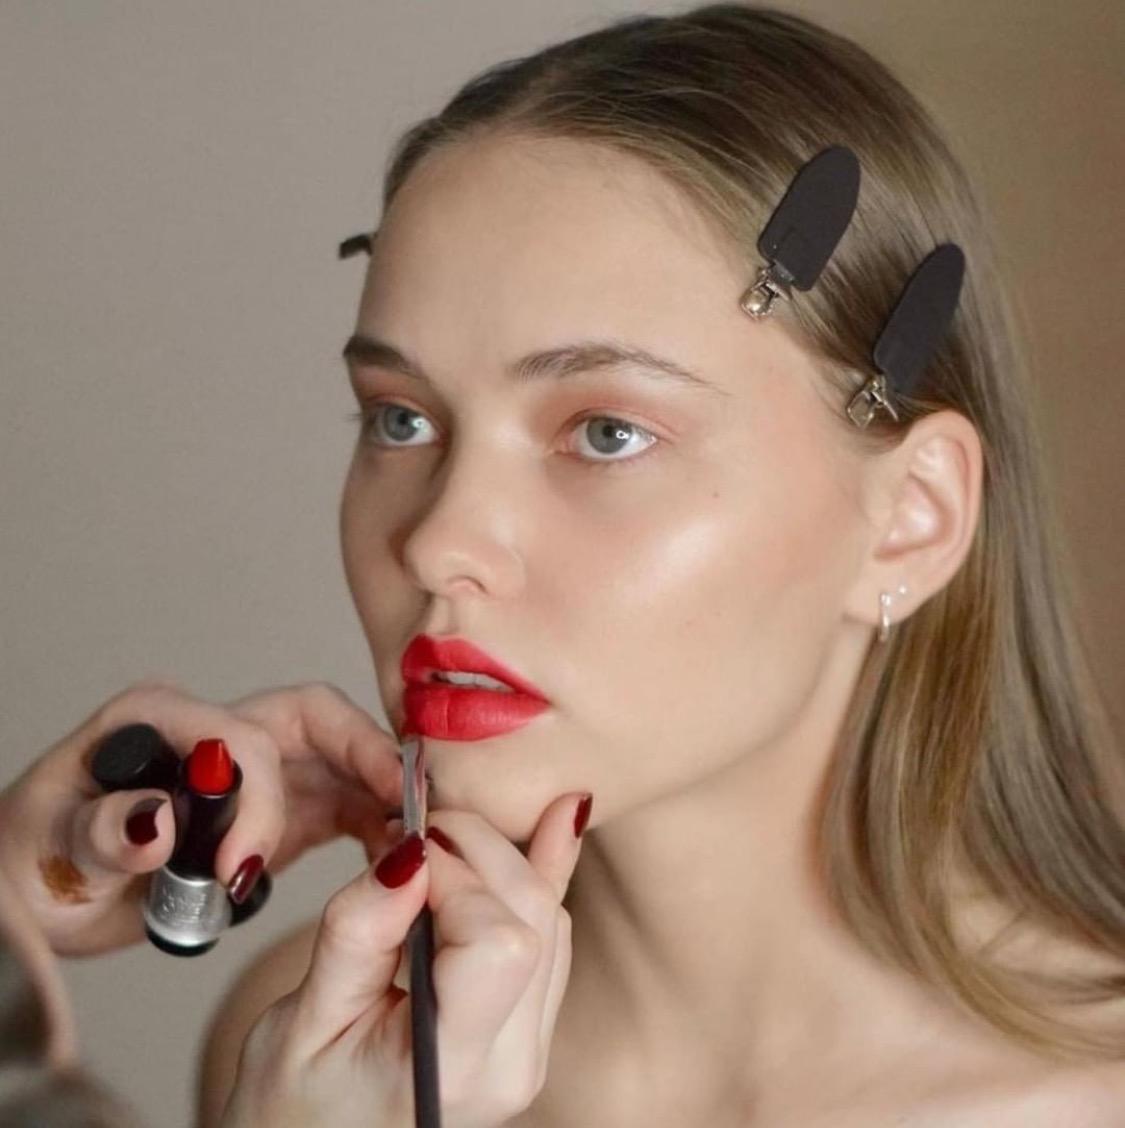 Make Up For Ever如何在抖音玩出了专业彩妆的调性? 营销深案例